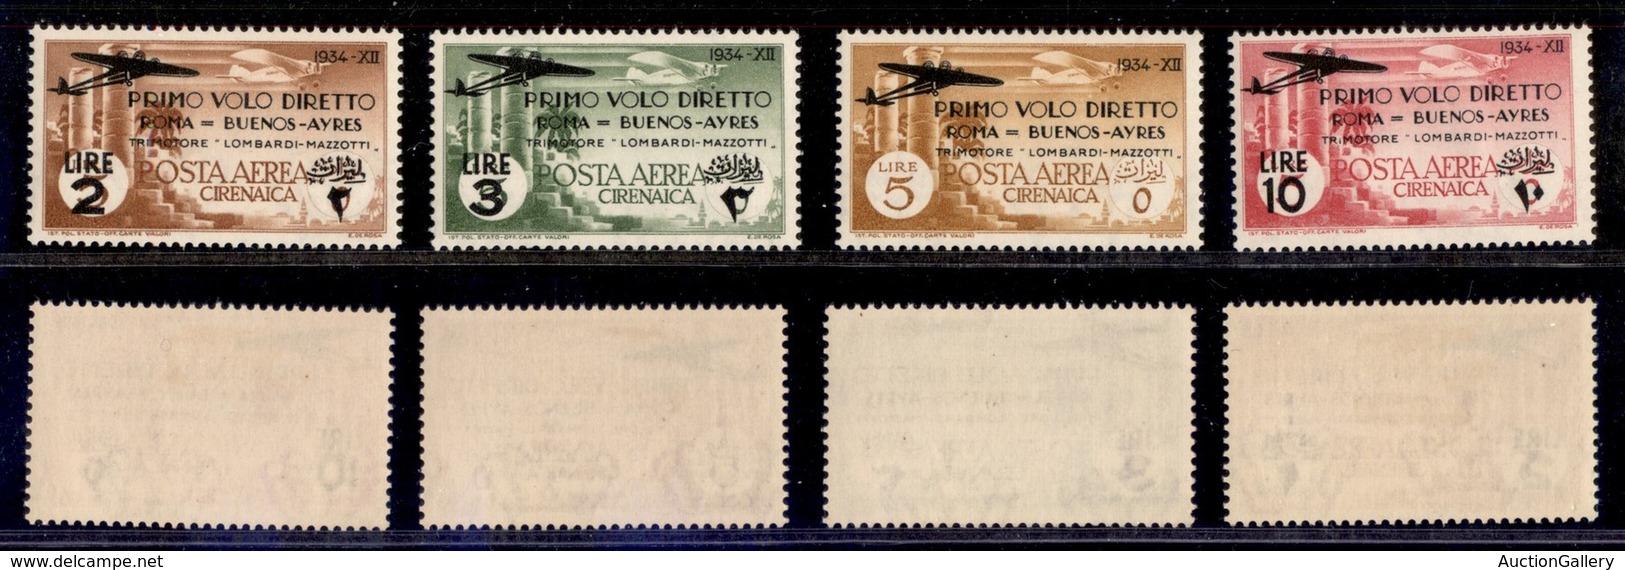 COLONIE - CIRENAICA - 1934 - Volo Roma-Buenos Aires (20/23 Aerea) - Serie Completa - Gomma Originale - Postzegels